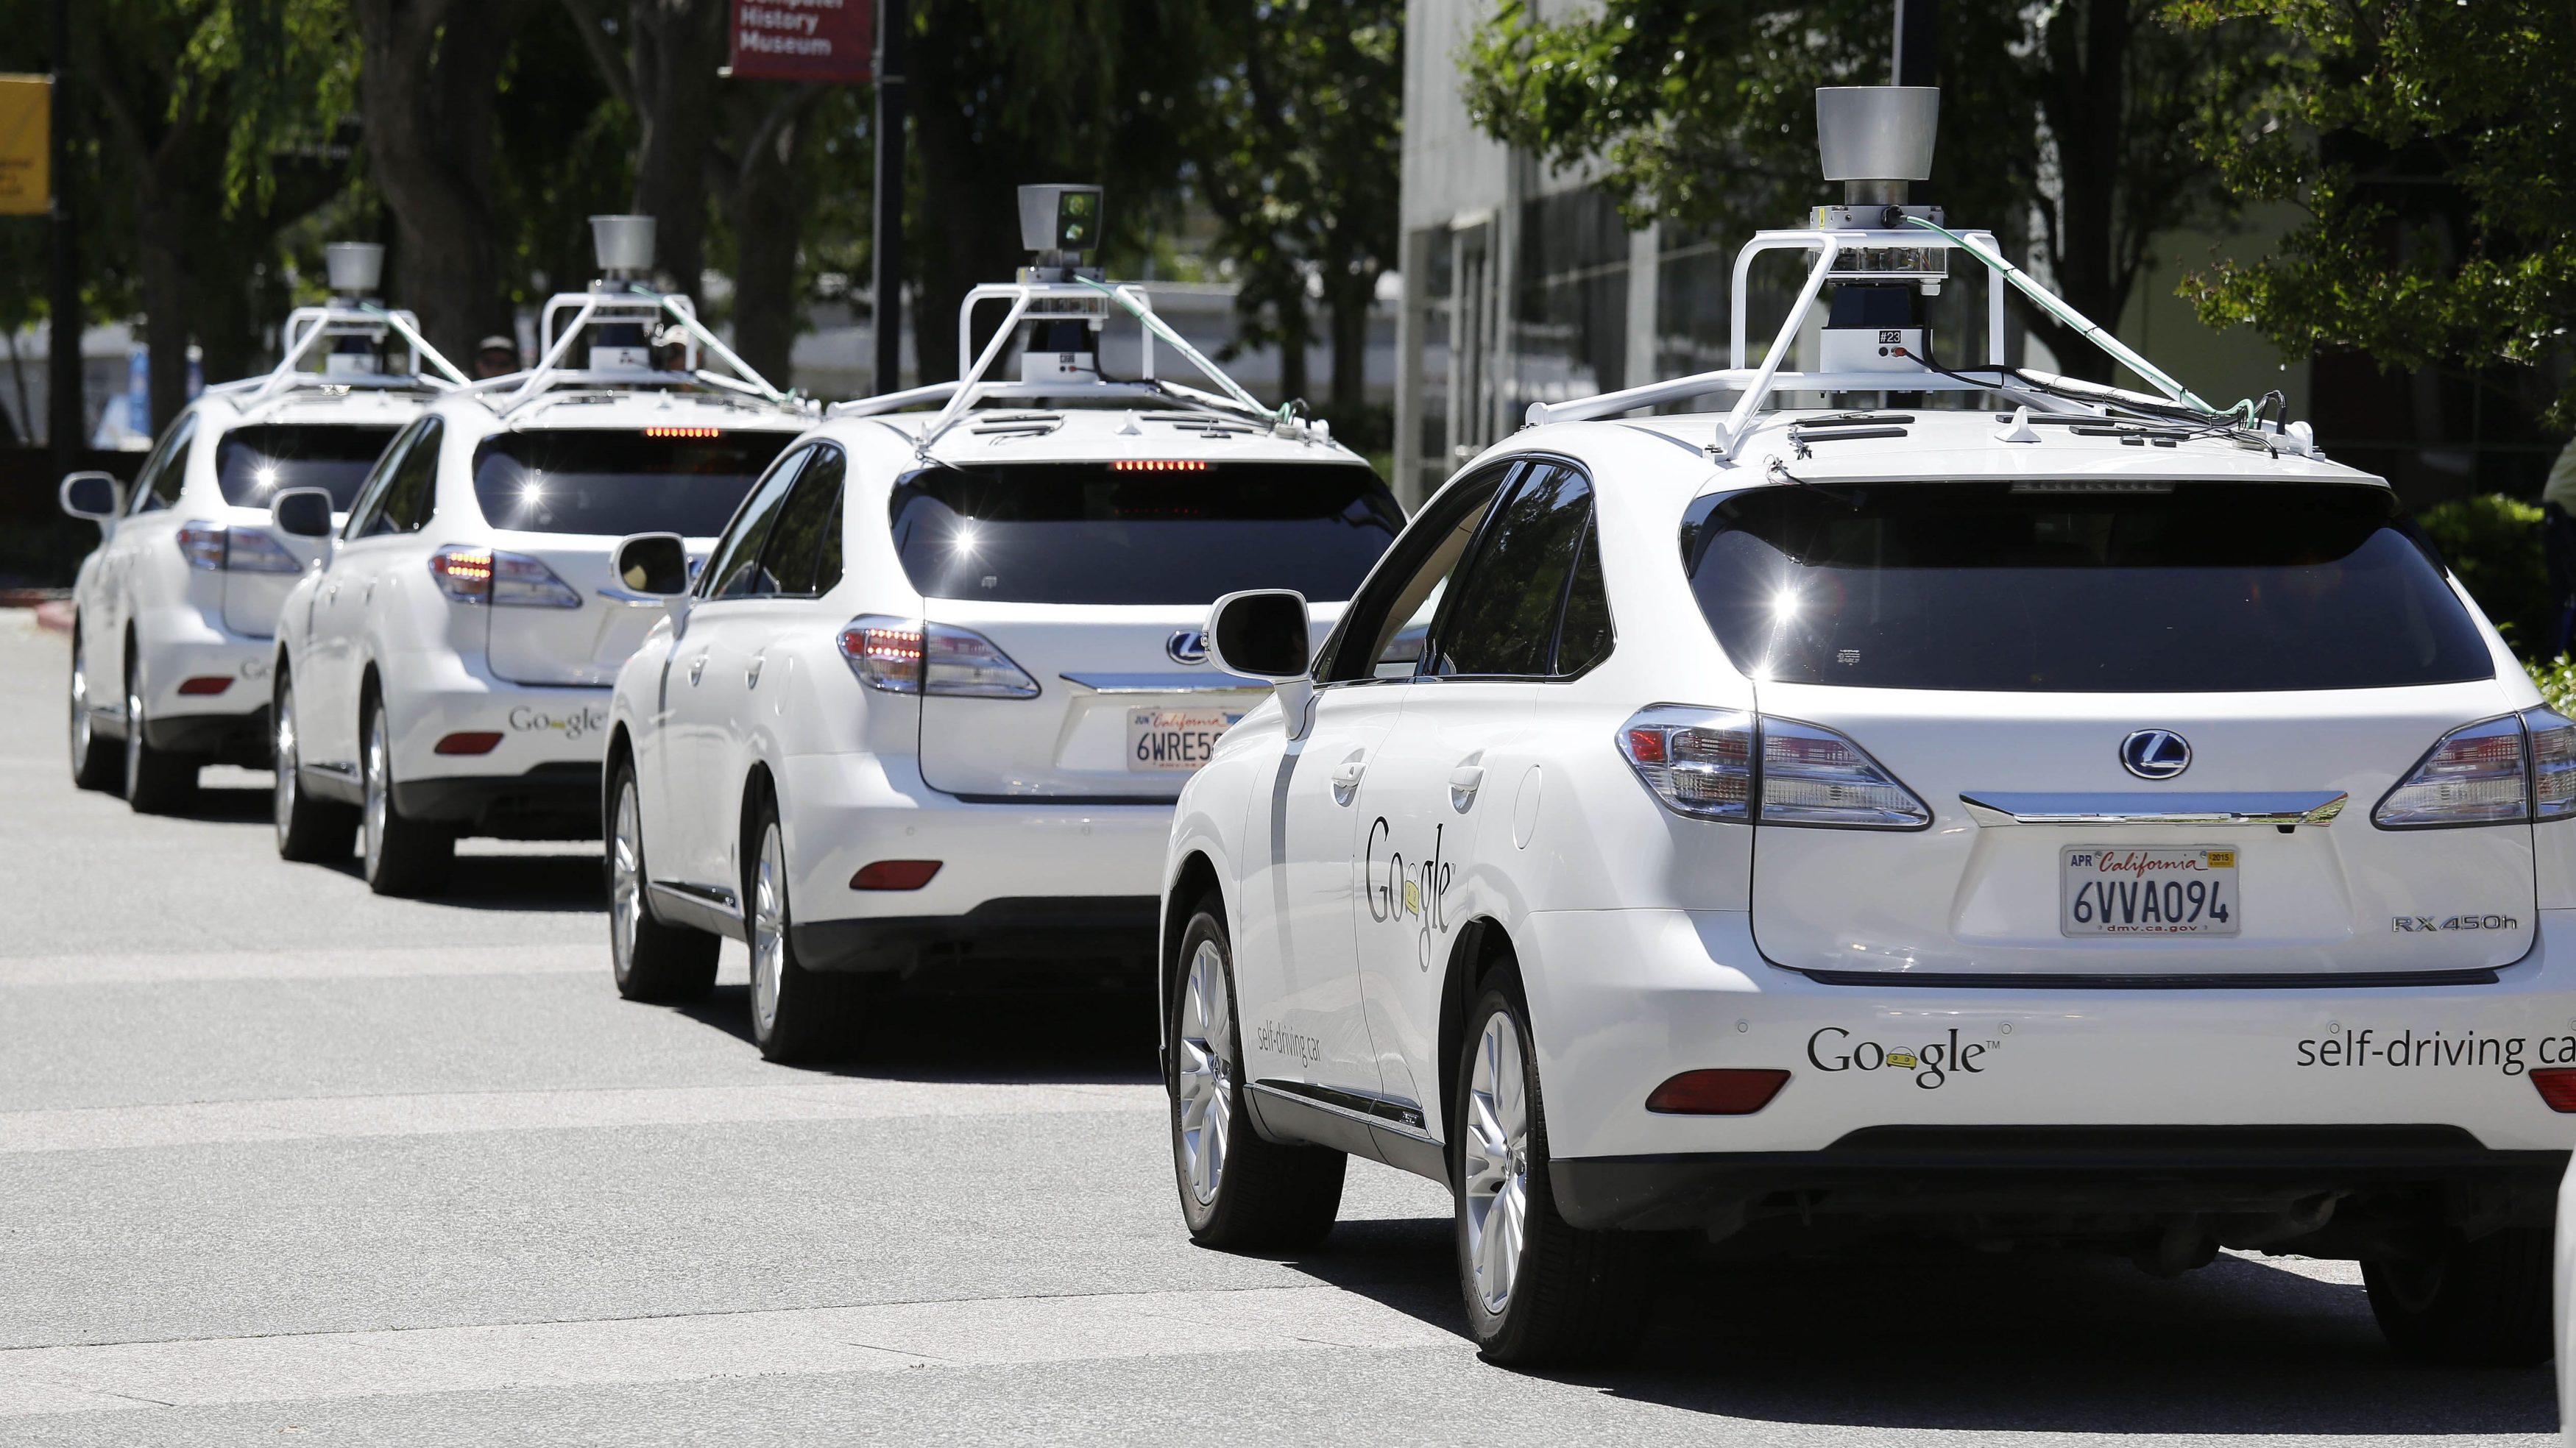 google-self-driving-cars-3500x1968.jpg